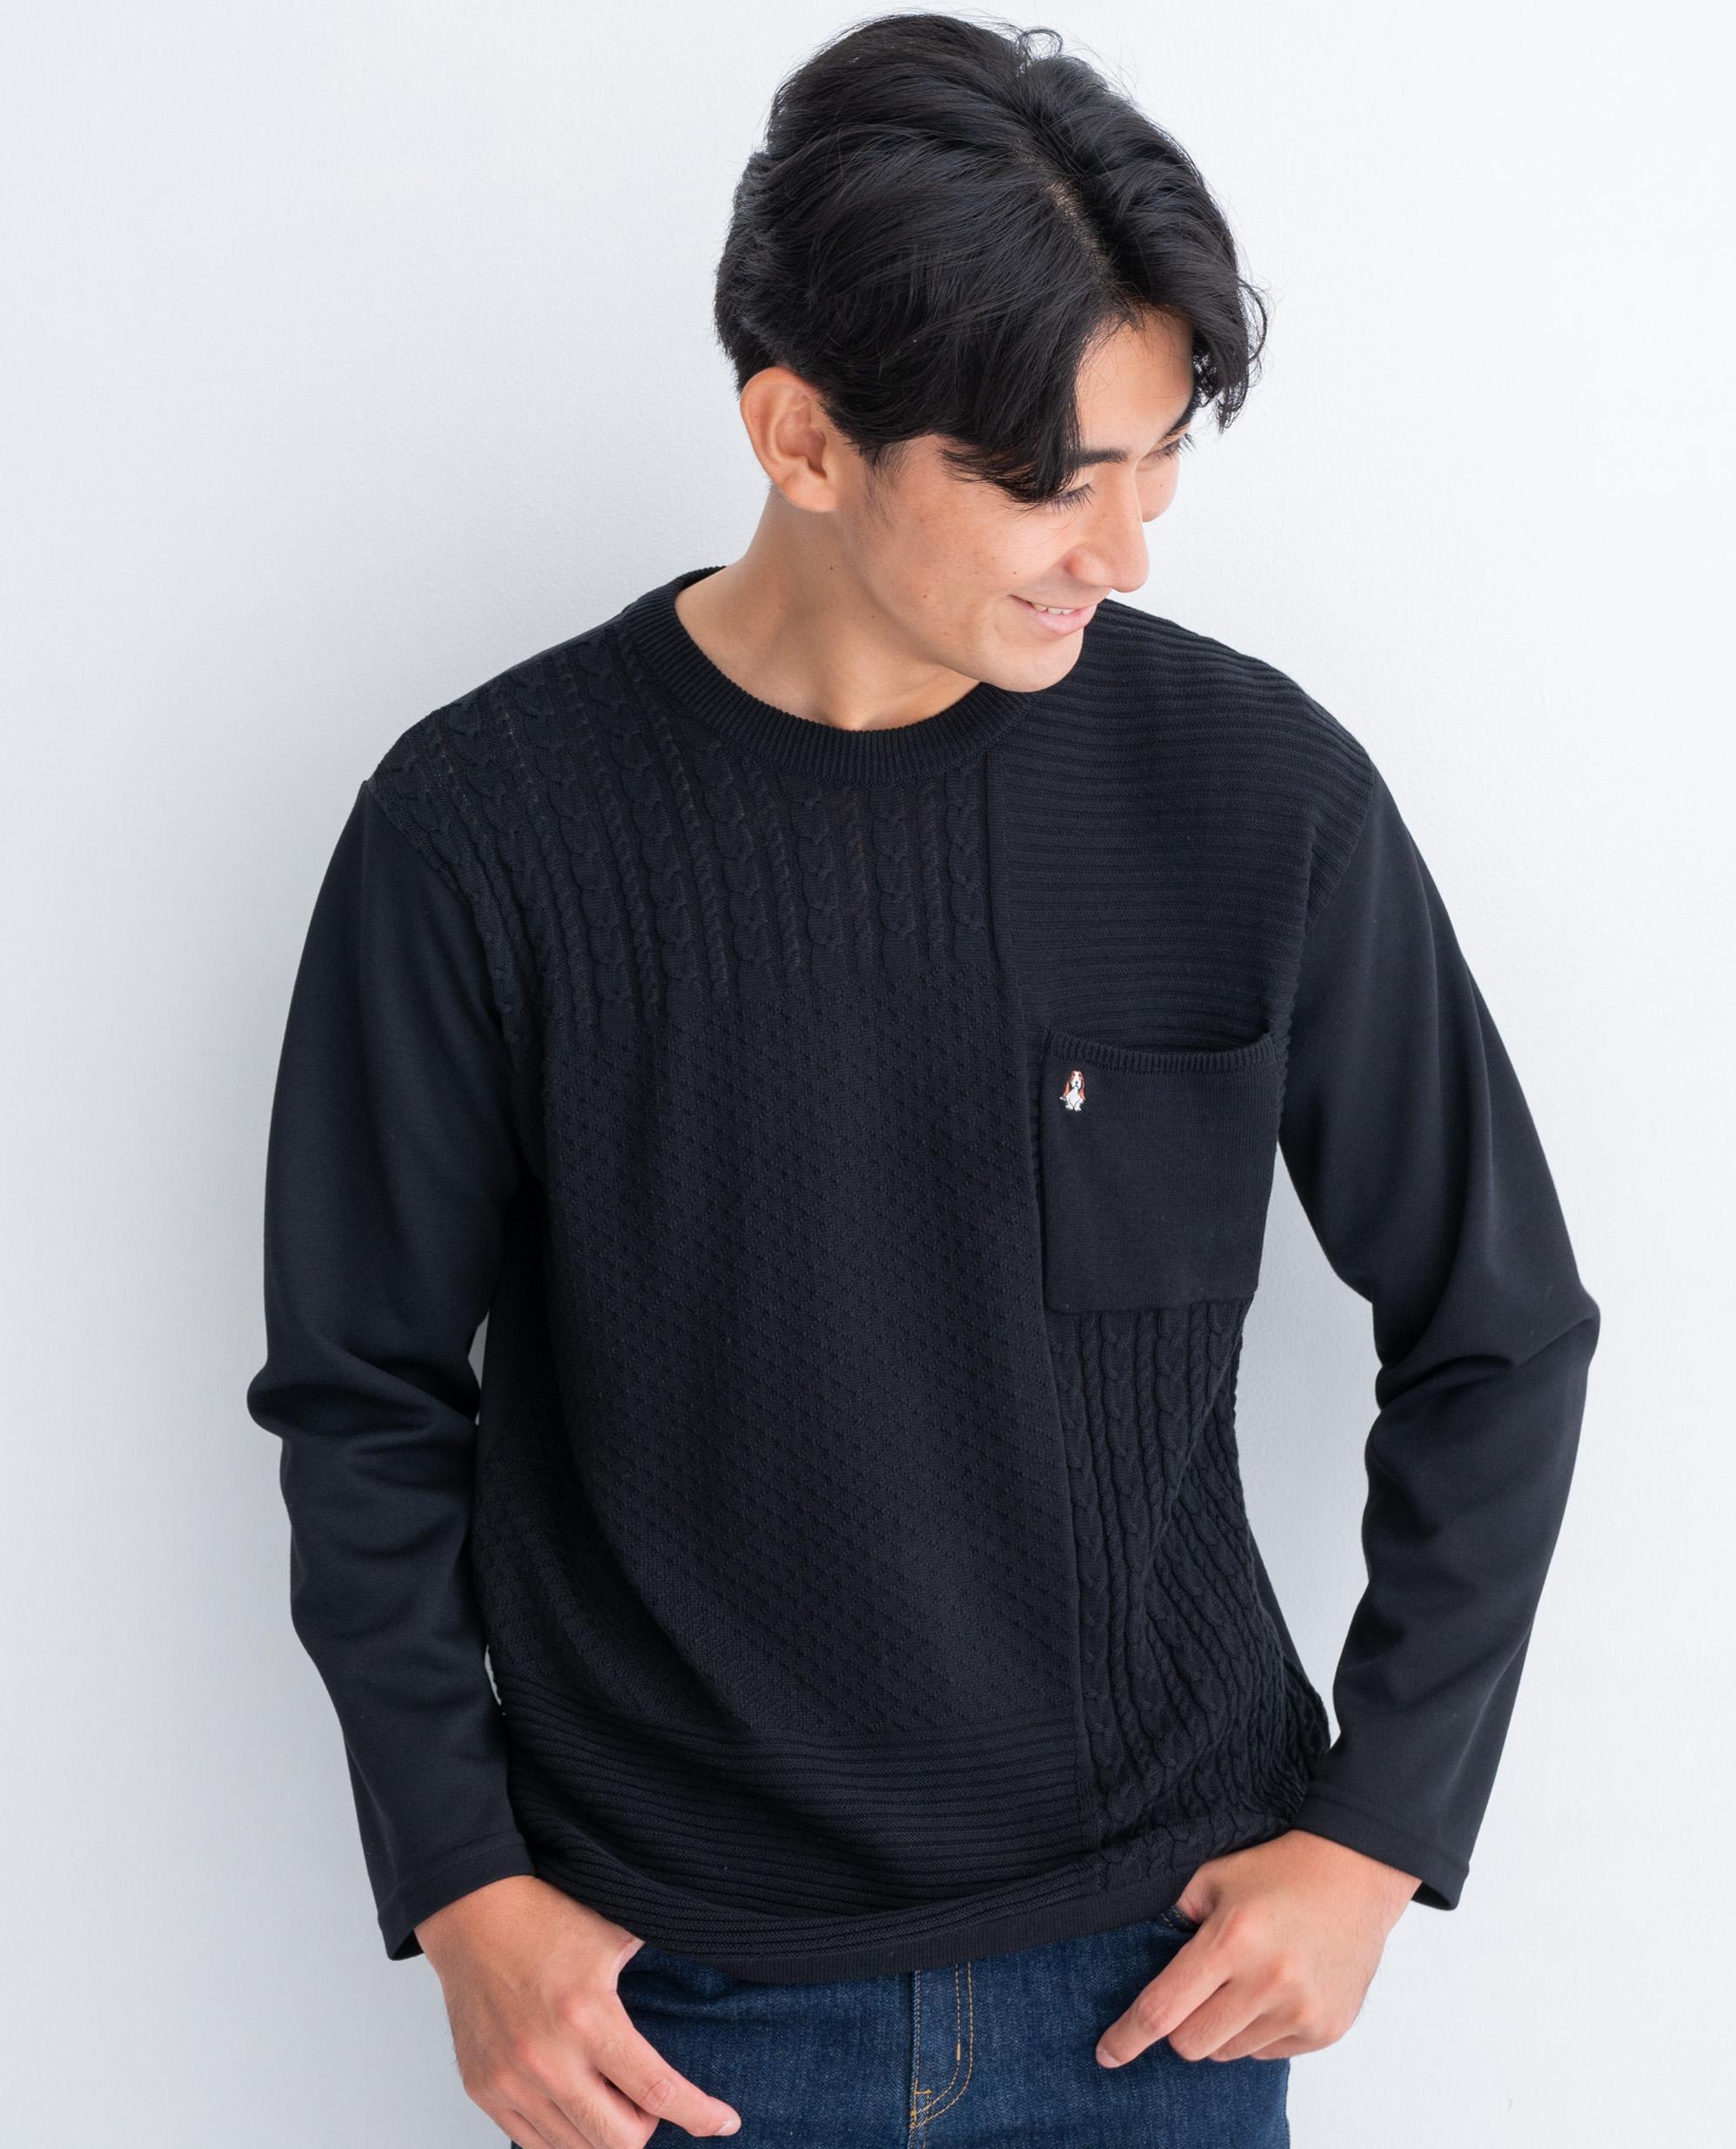 12GニットポンチHBポケット付き長袖Tシャツ